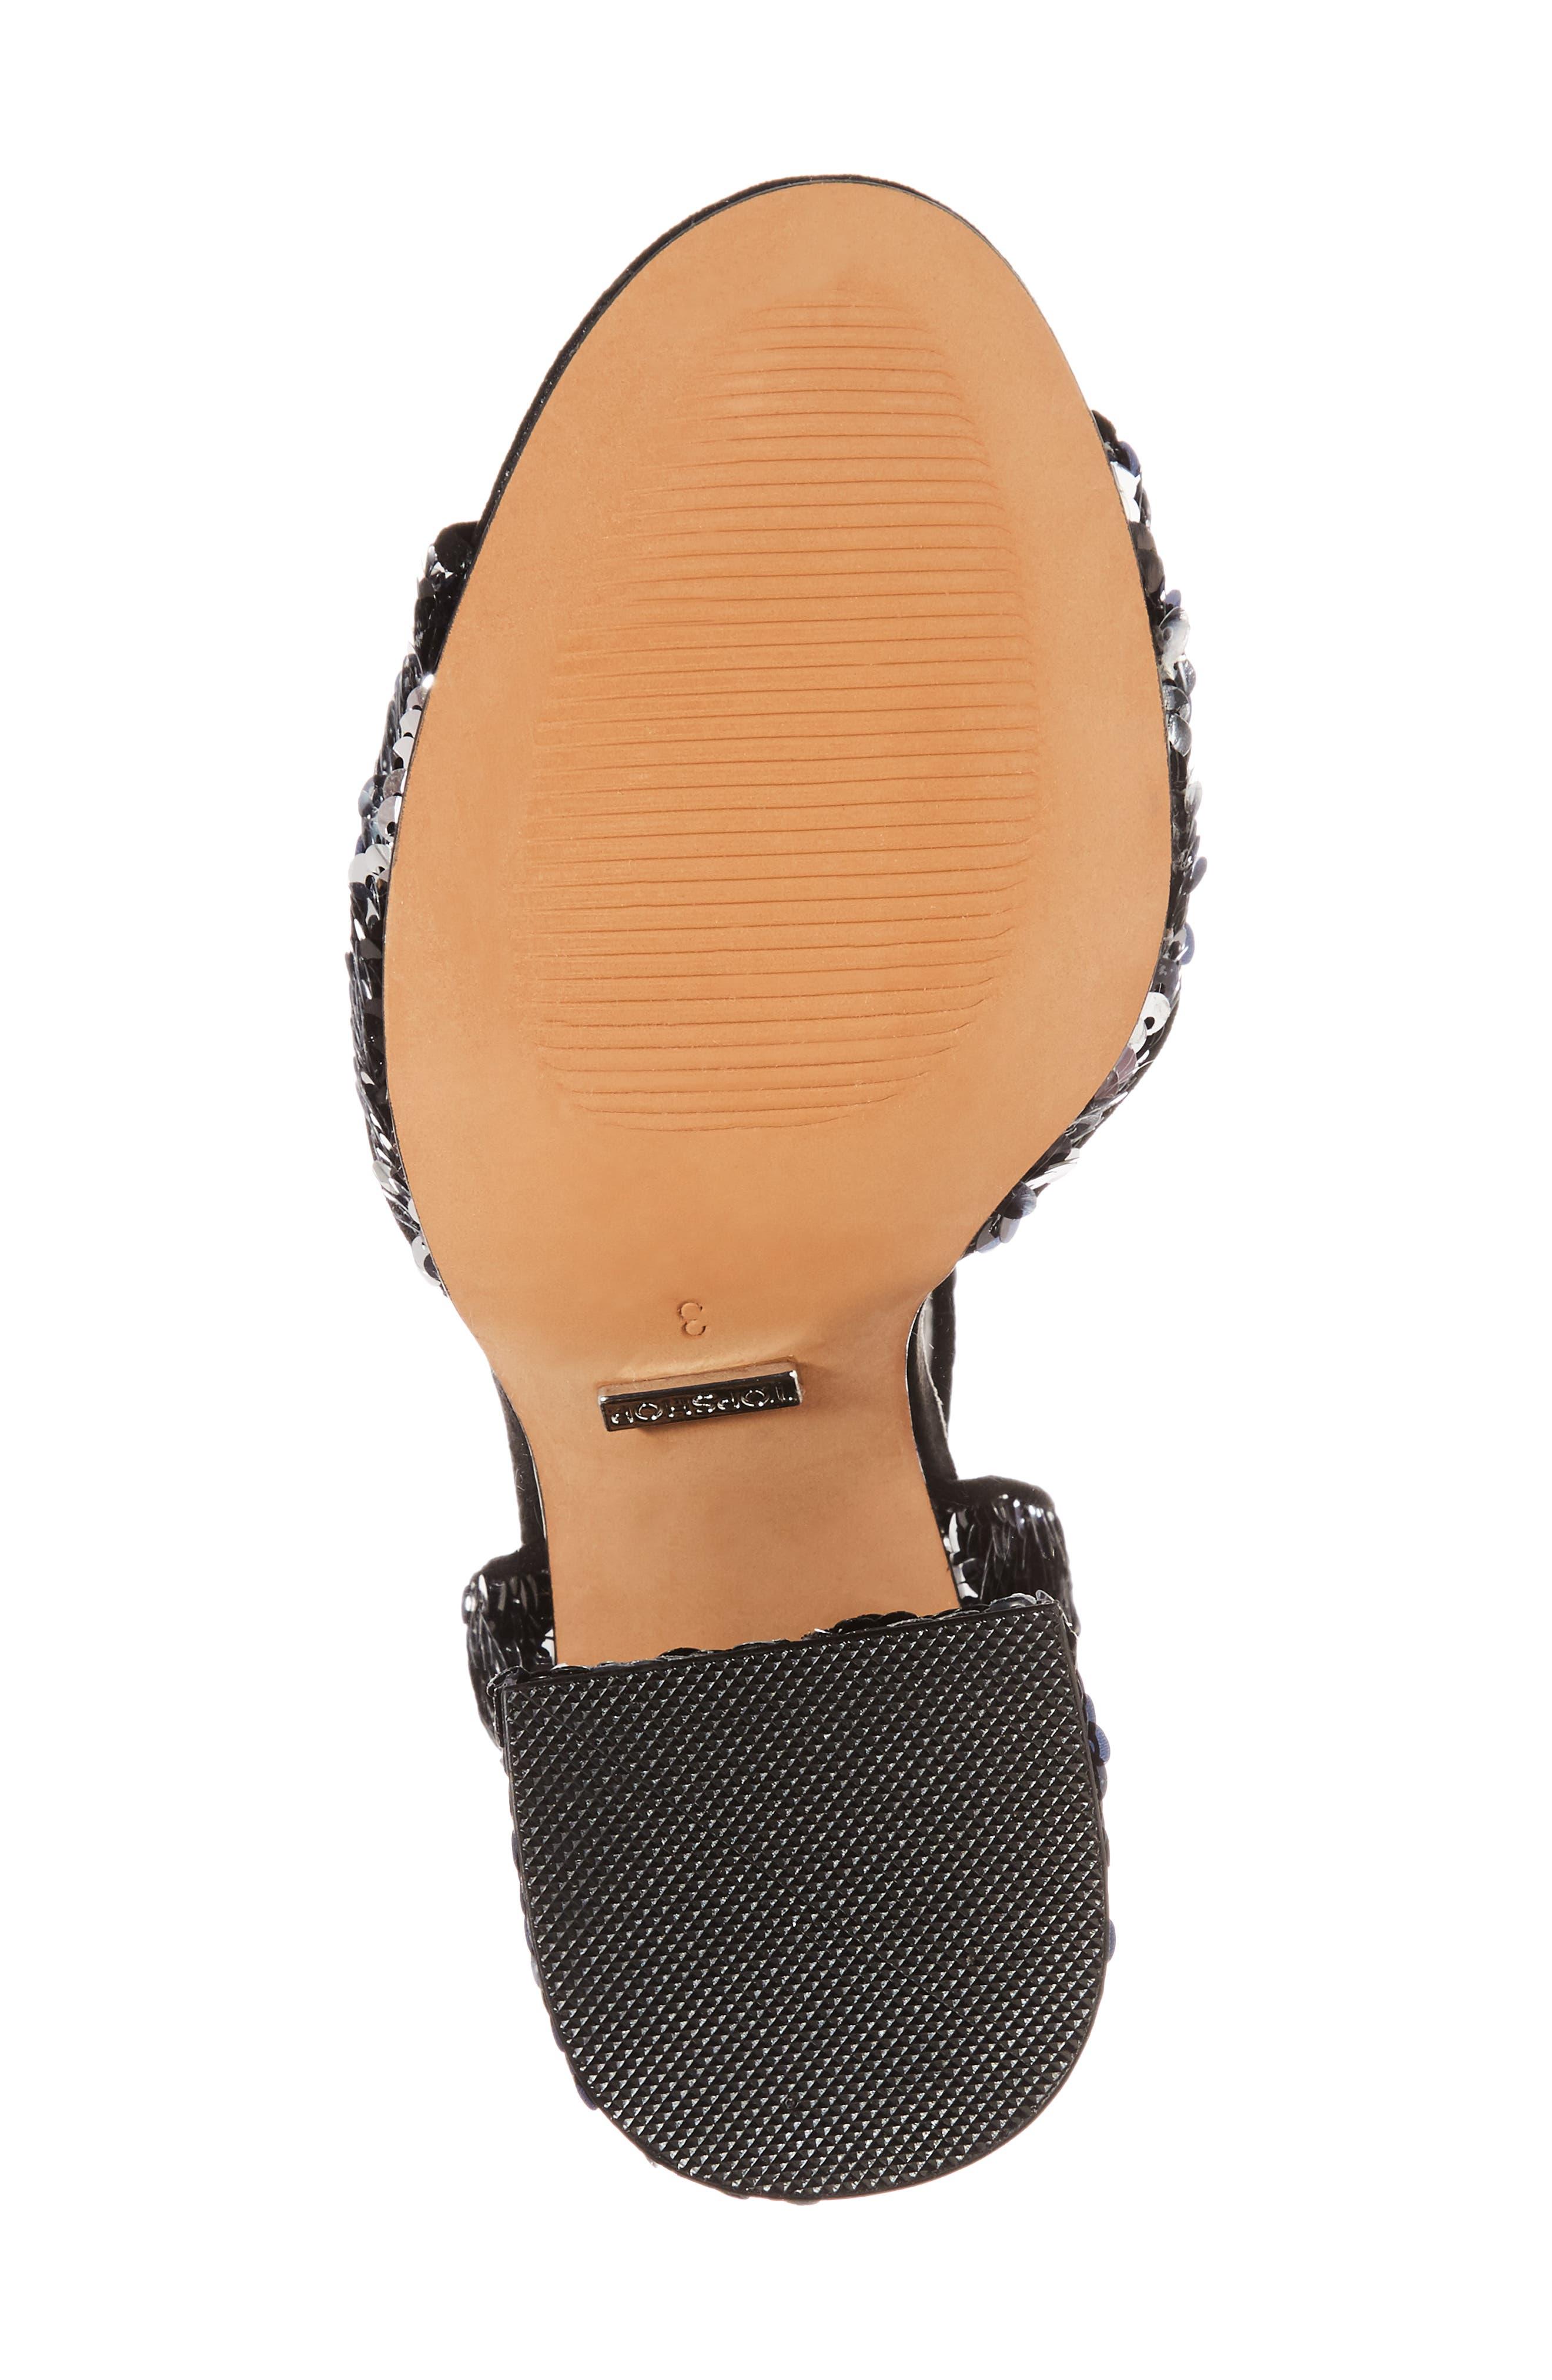 Reaction Sequin Block Heel Sandal,                             Alternate thumbnail 6, color,                             Black Multi